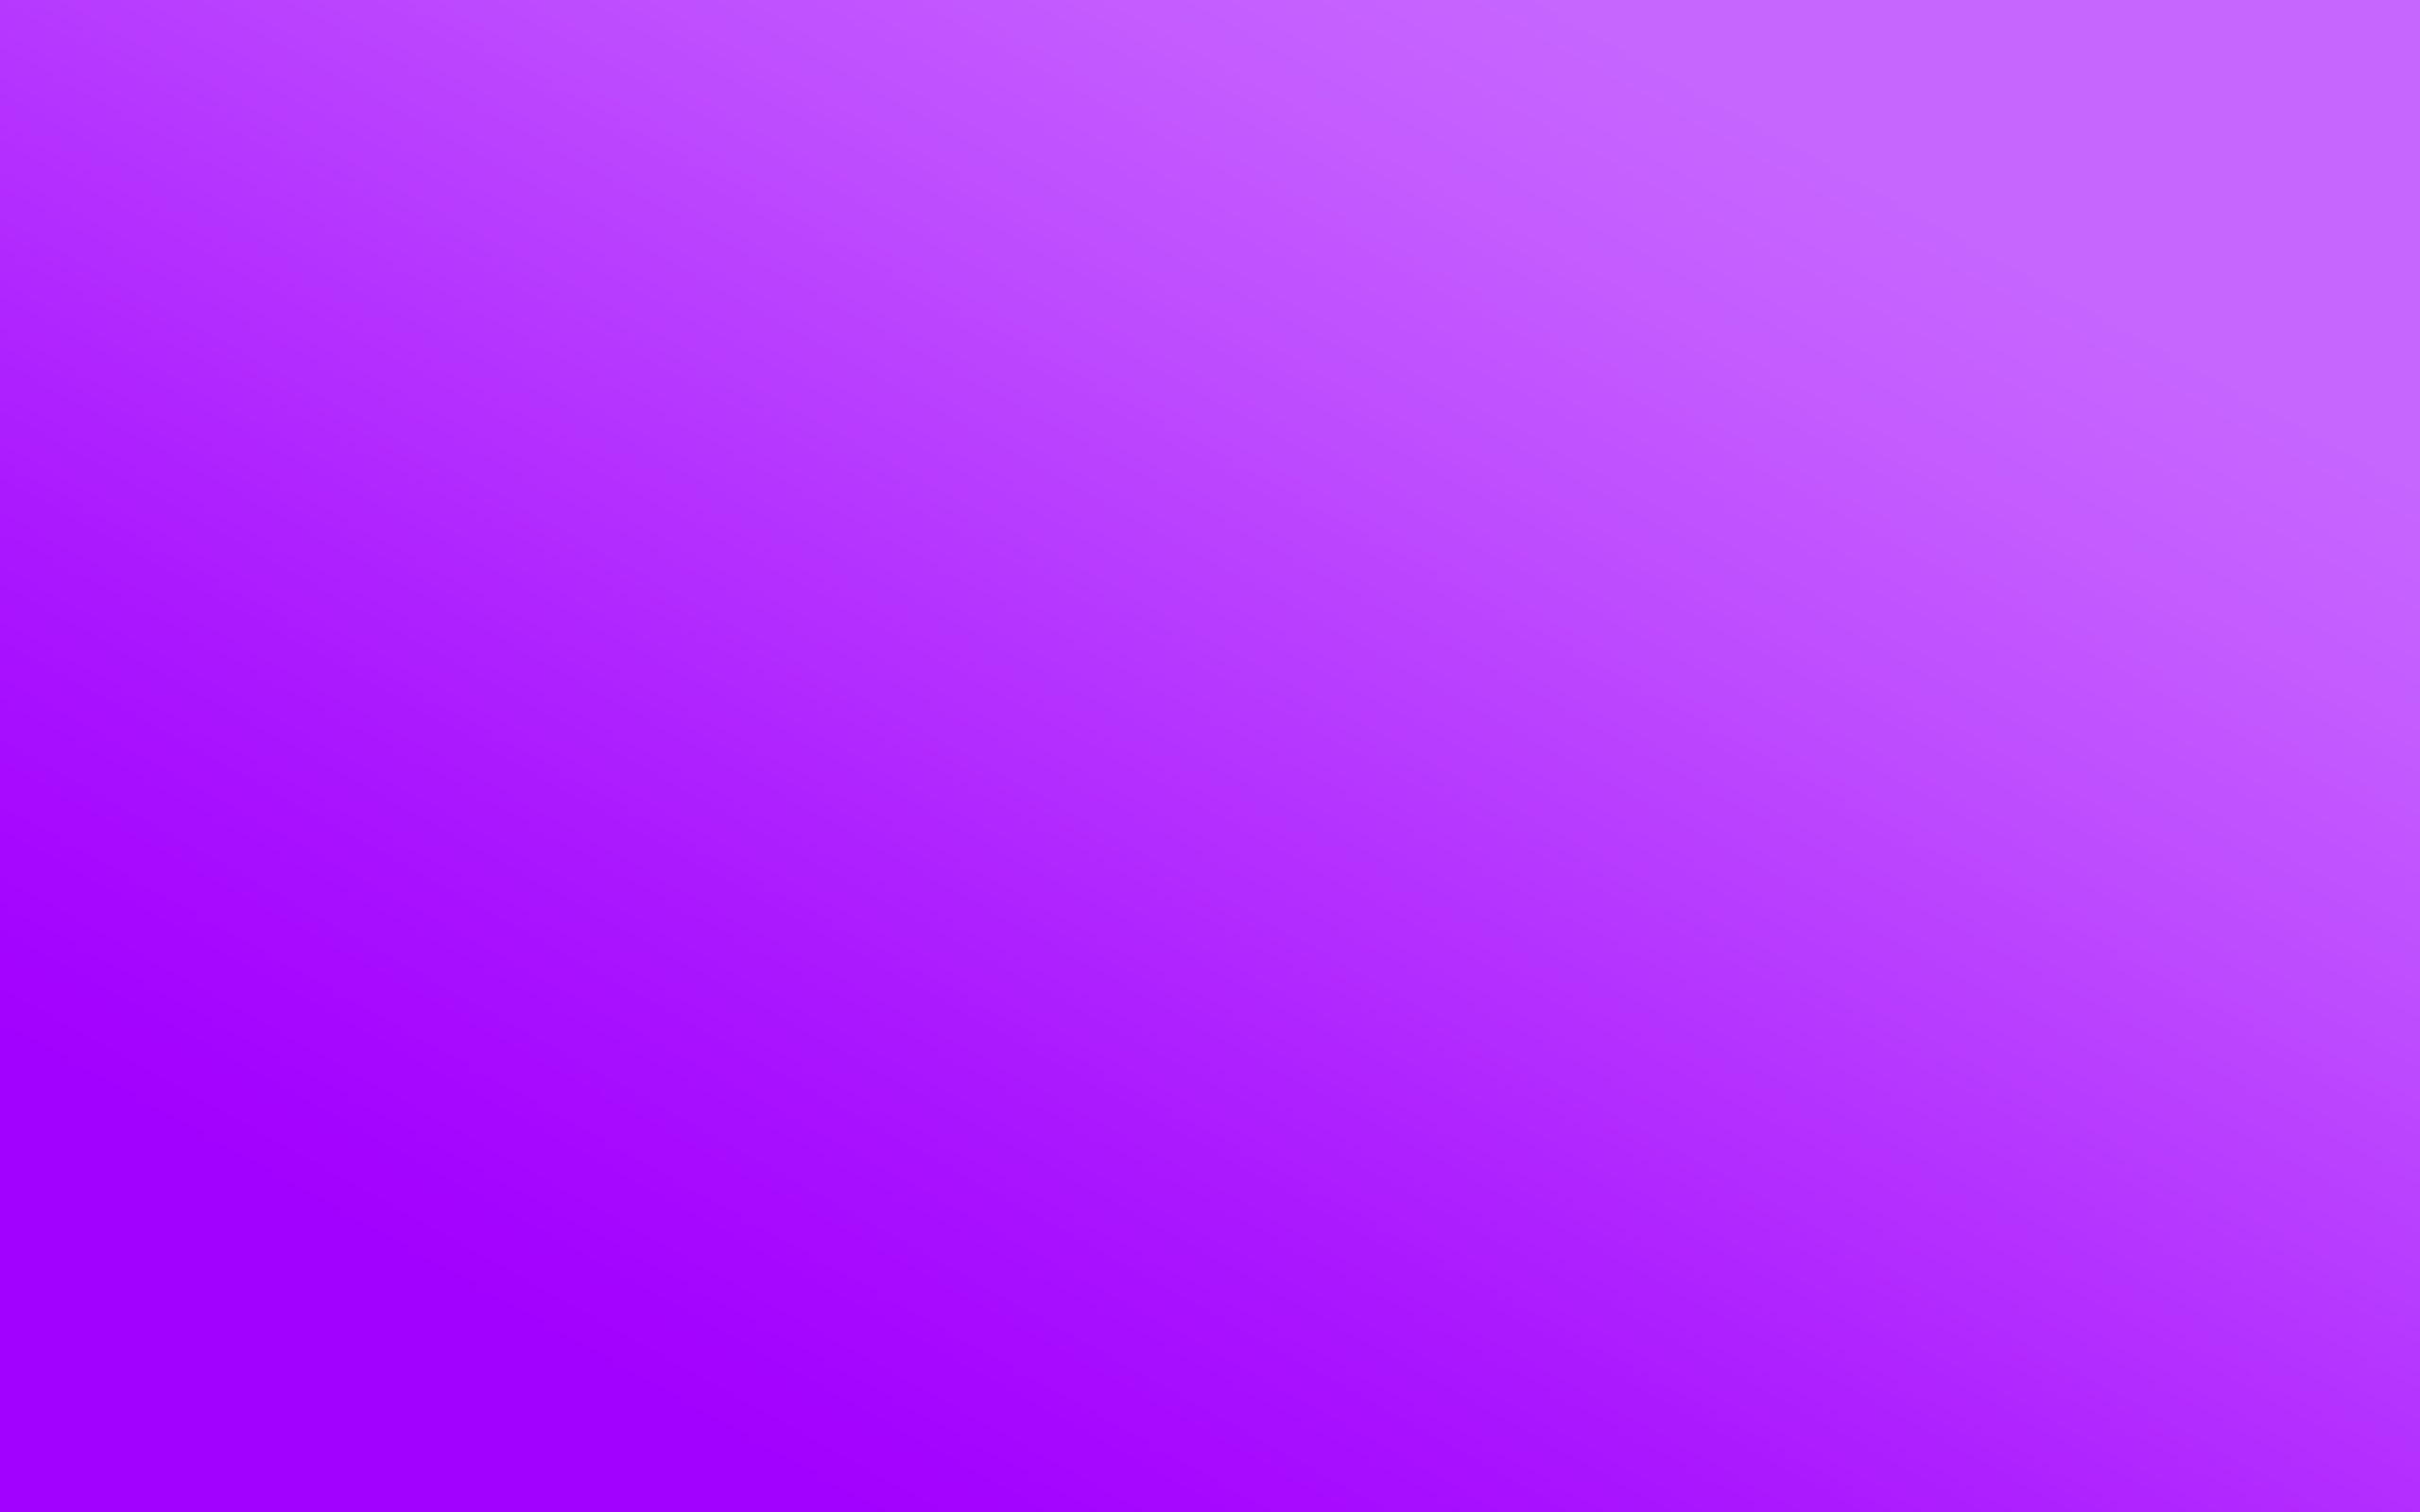 Solid Colors Purple Wallpaper Hd Purple Ombre Wallpaper Purple Wallpaper Ombre Wallpapers